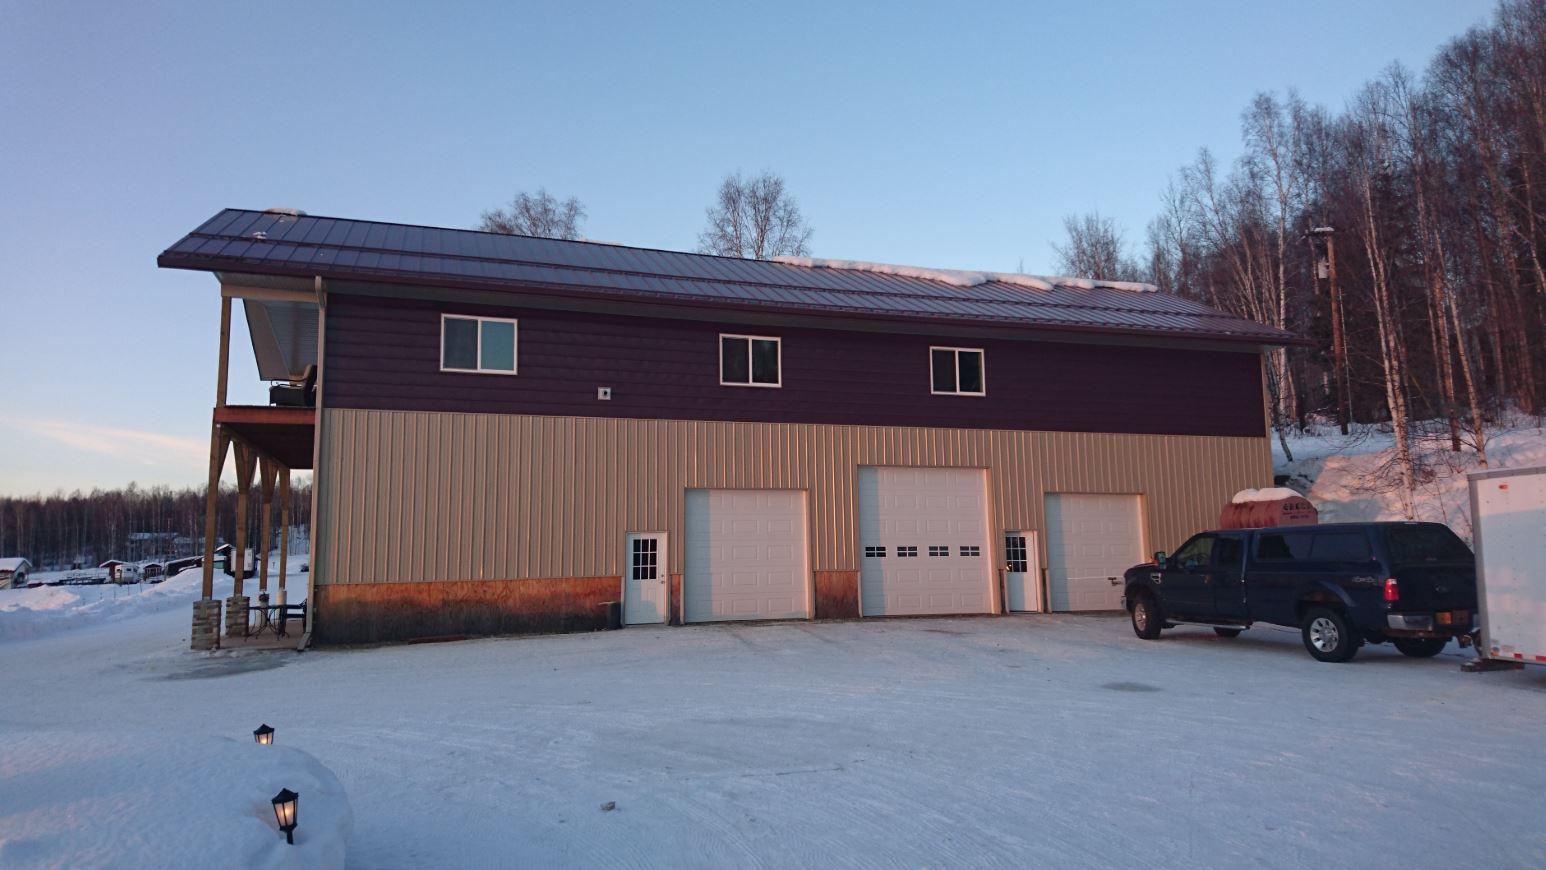 Metal siding building